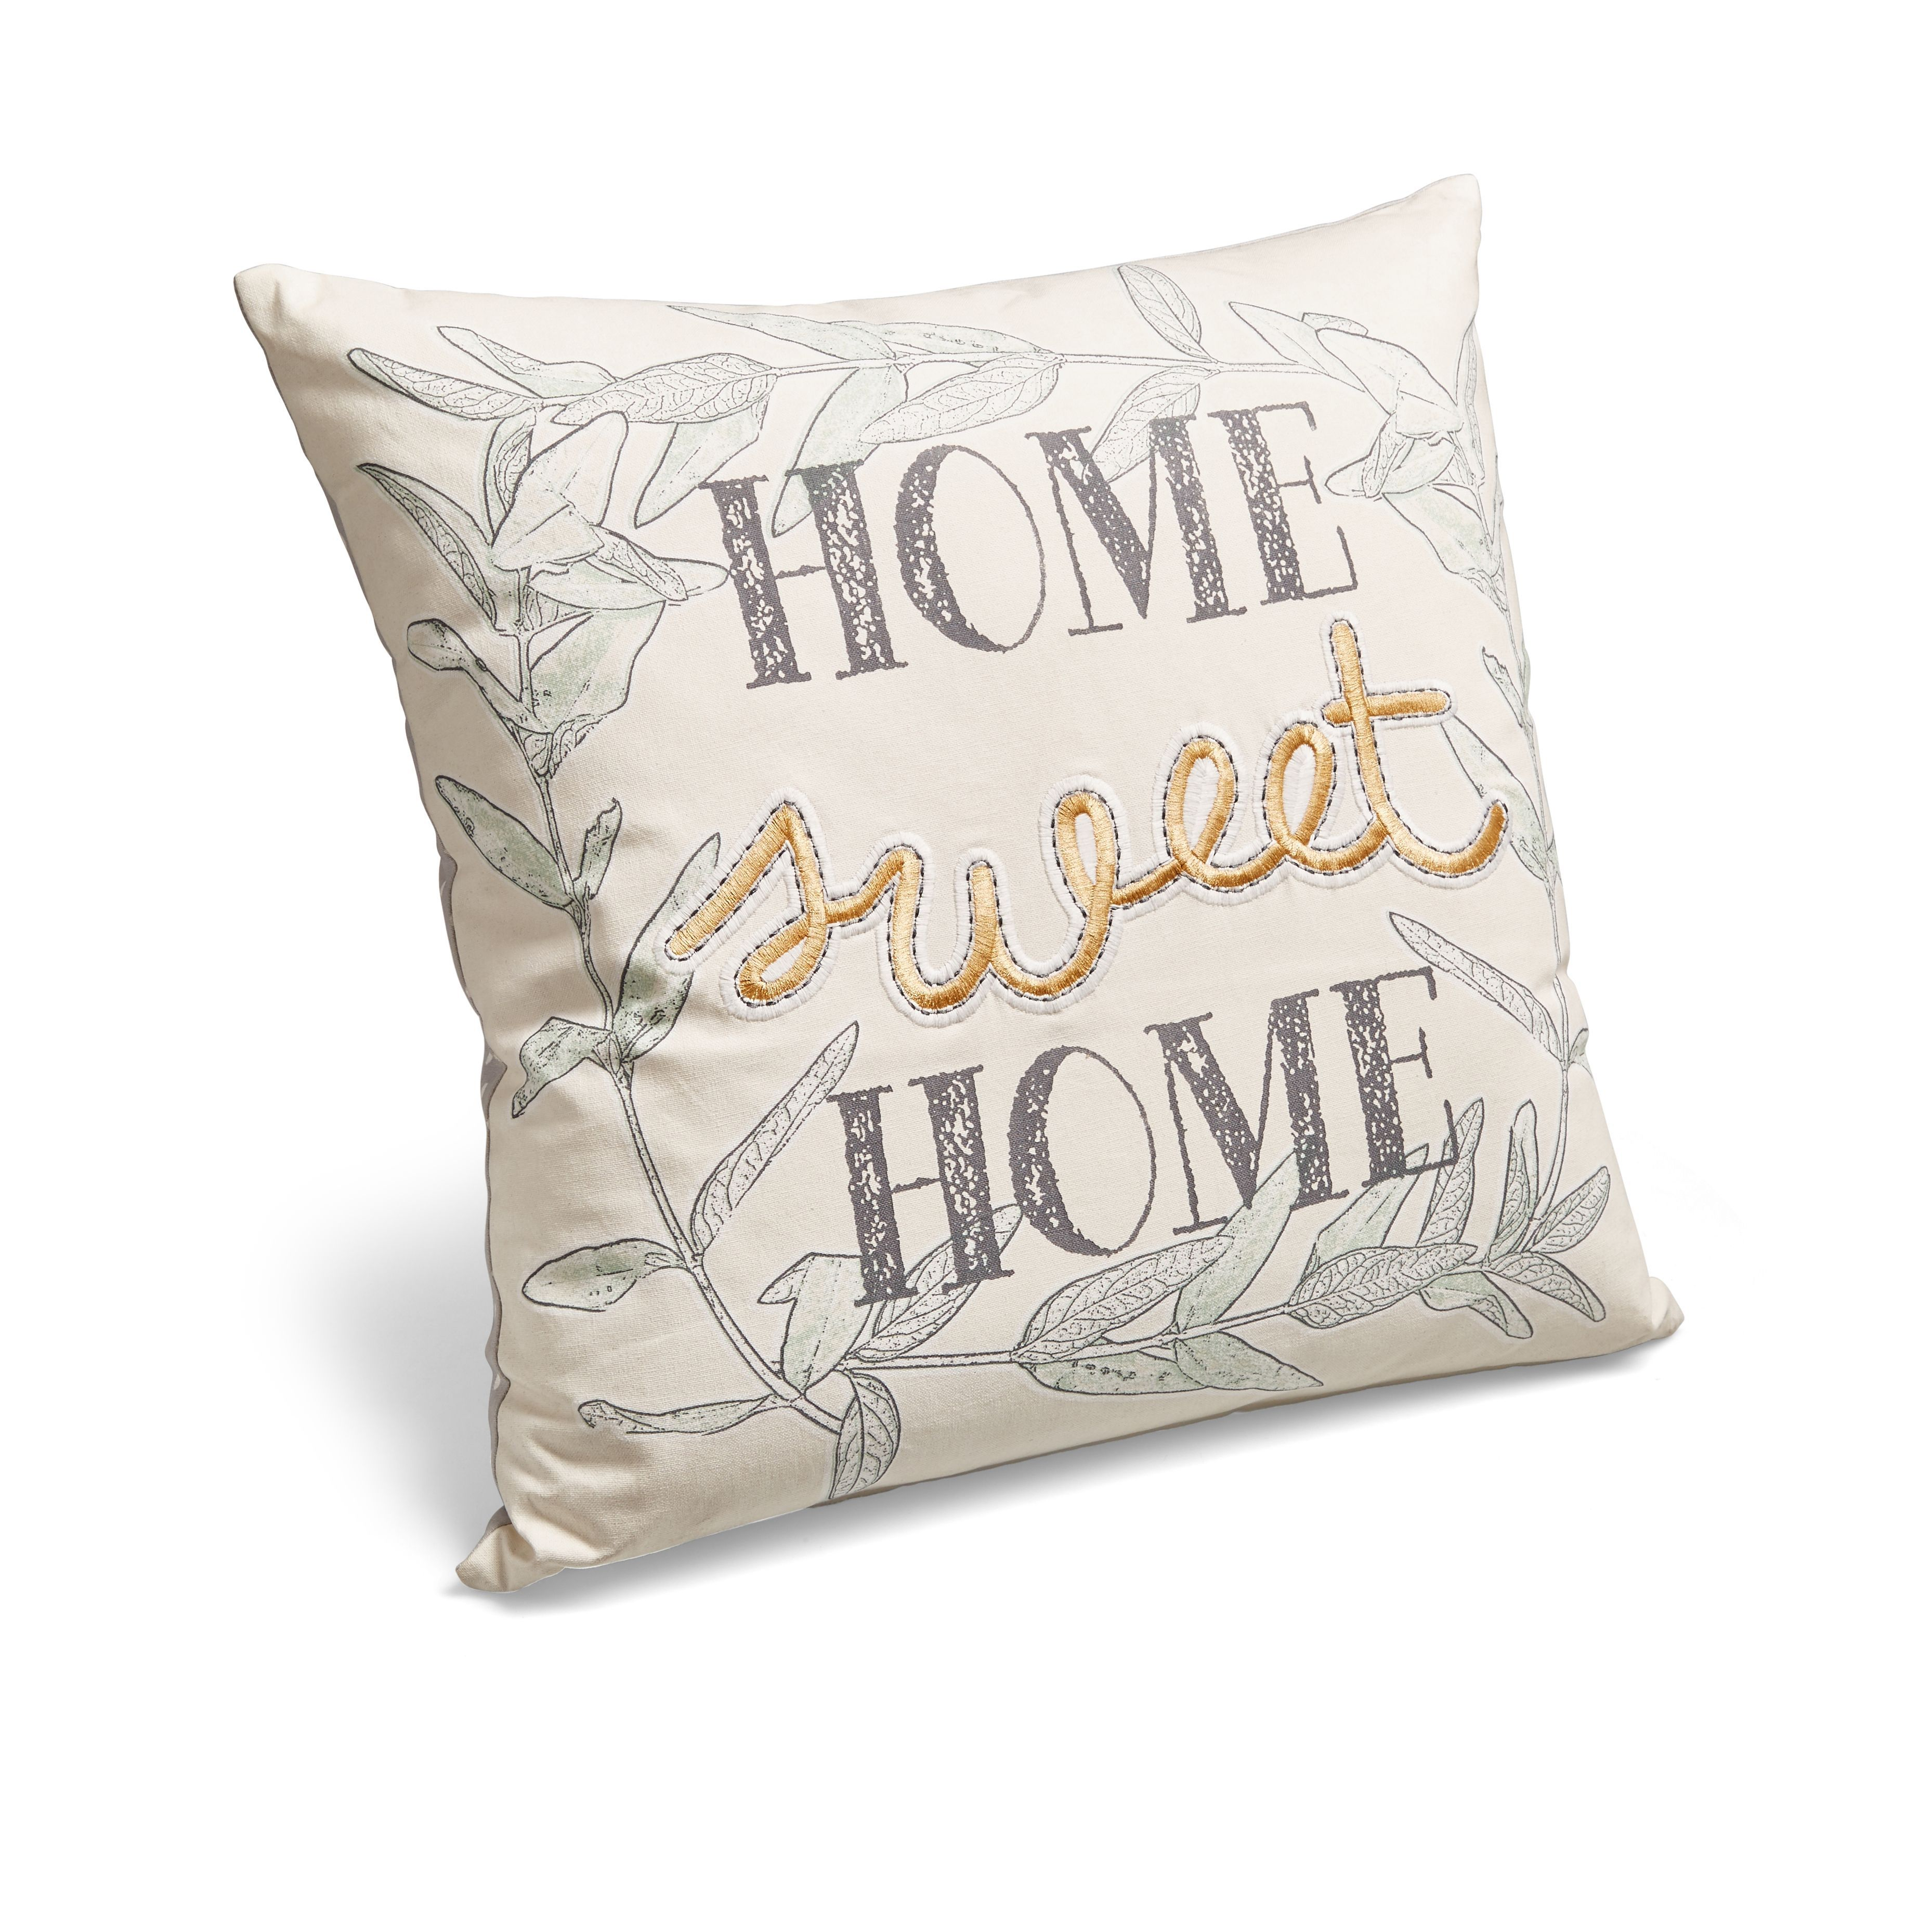 Home Sweet Home Cream & Grey Cushion